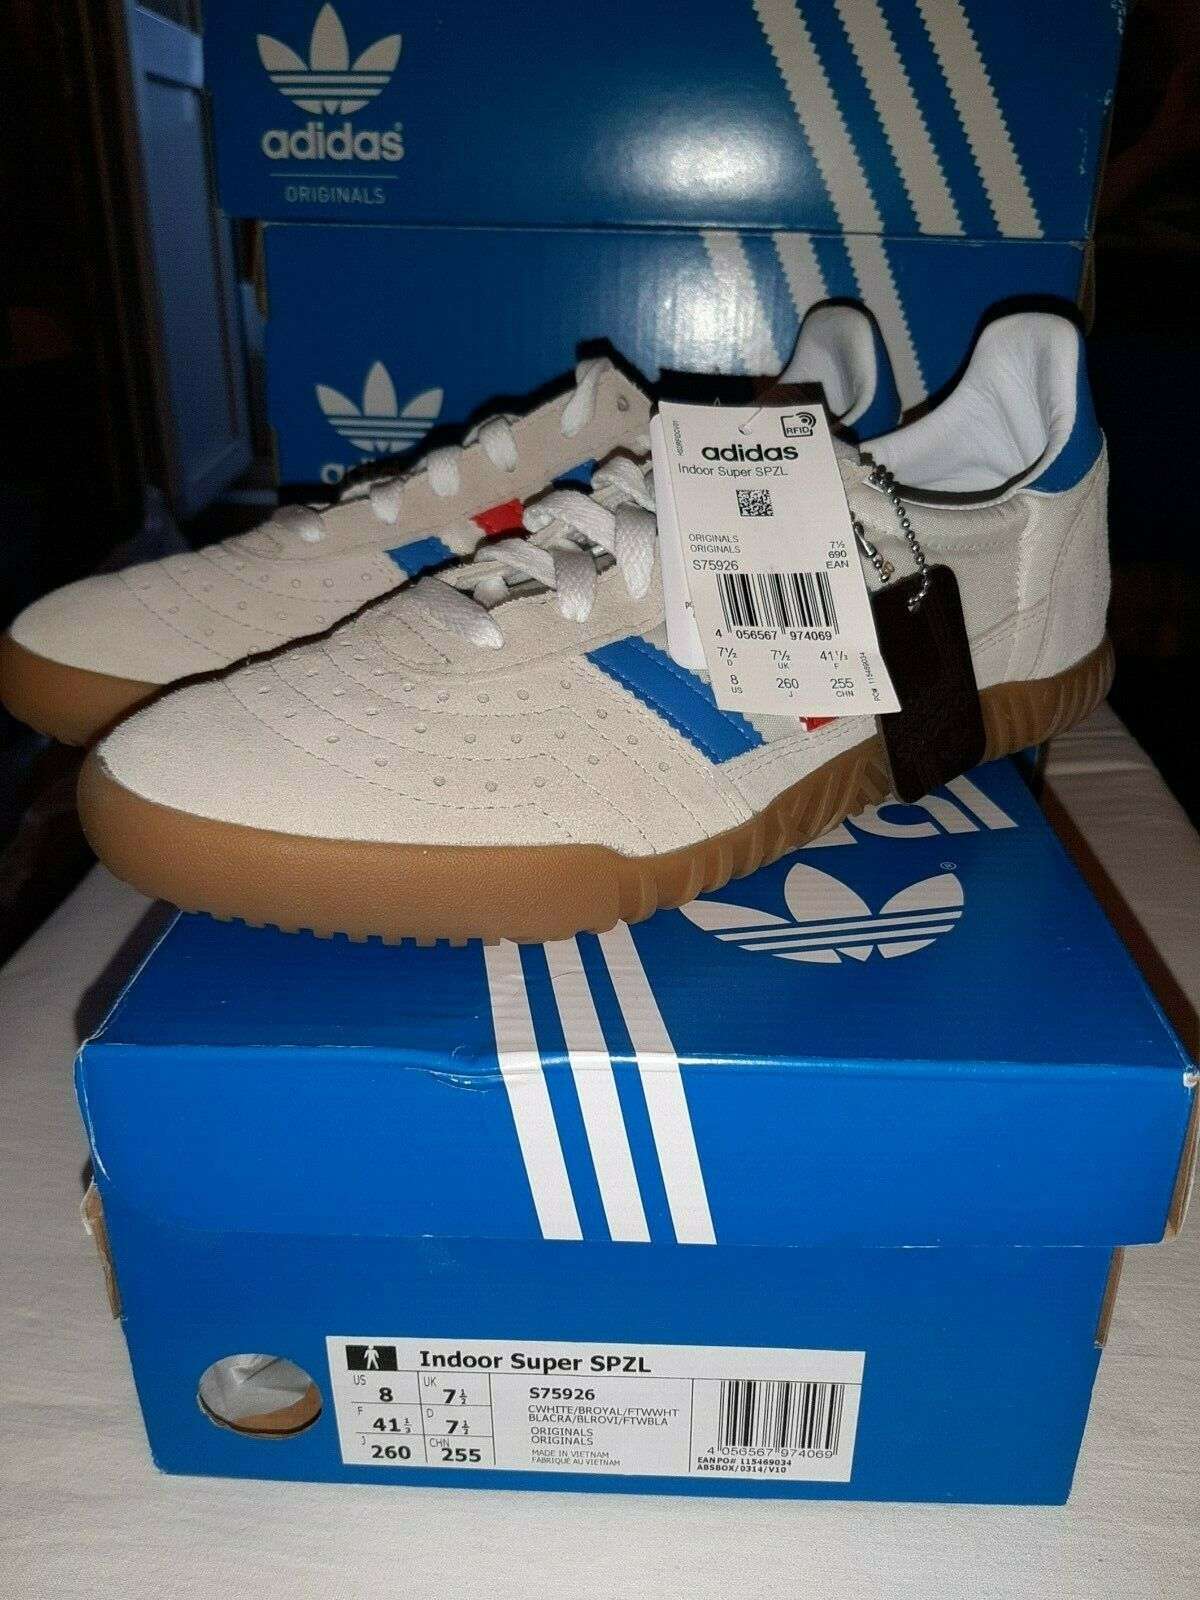 Adidas indoor Super X Spezial S75926 UK 7,5 US 8 spzl EntièreHommest neuf dans sa boîte